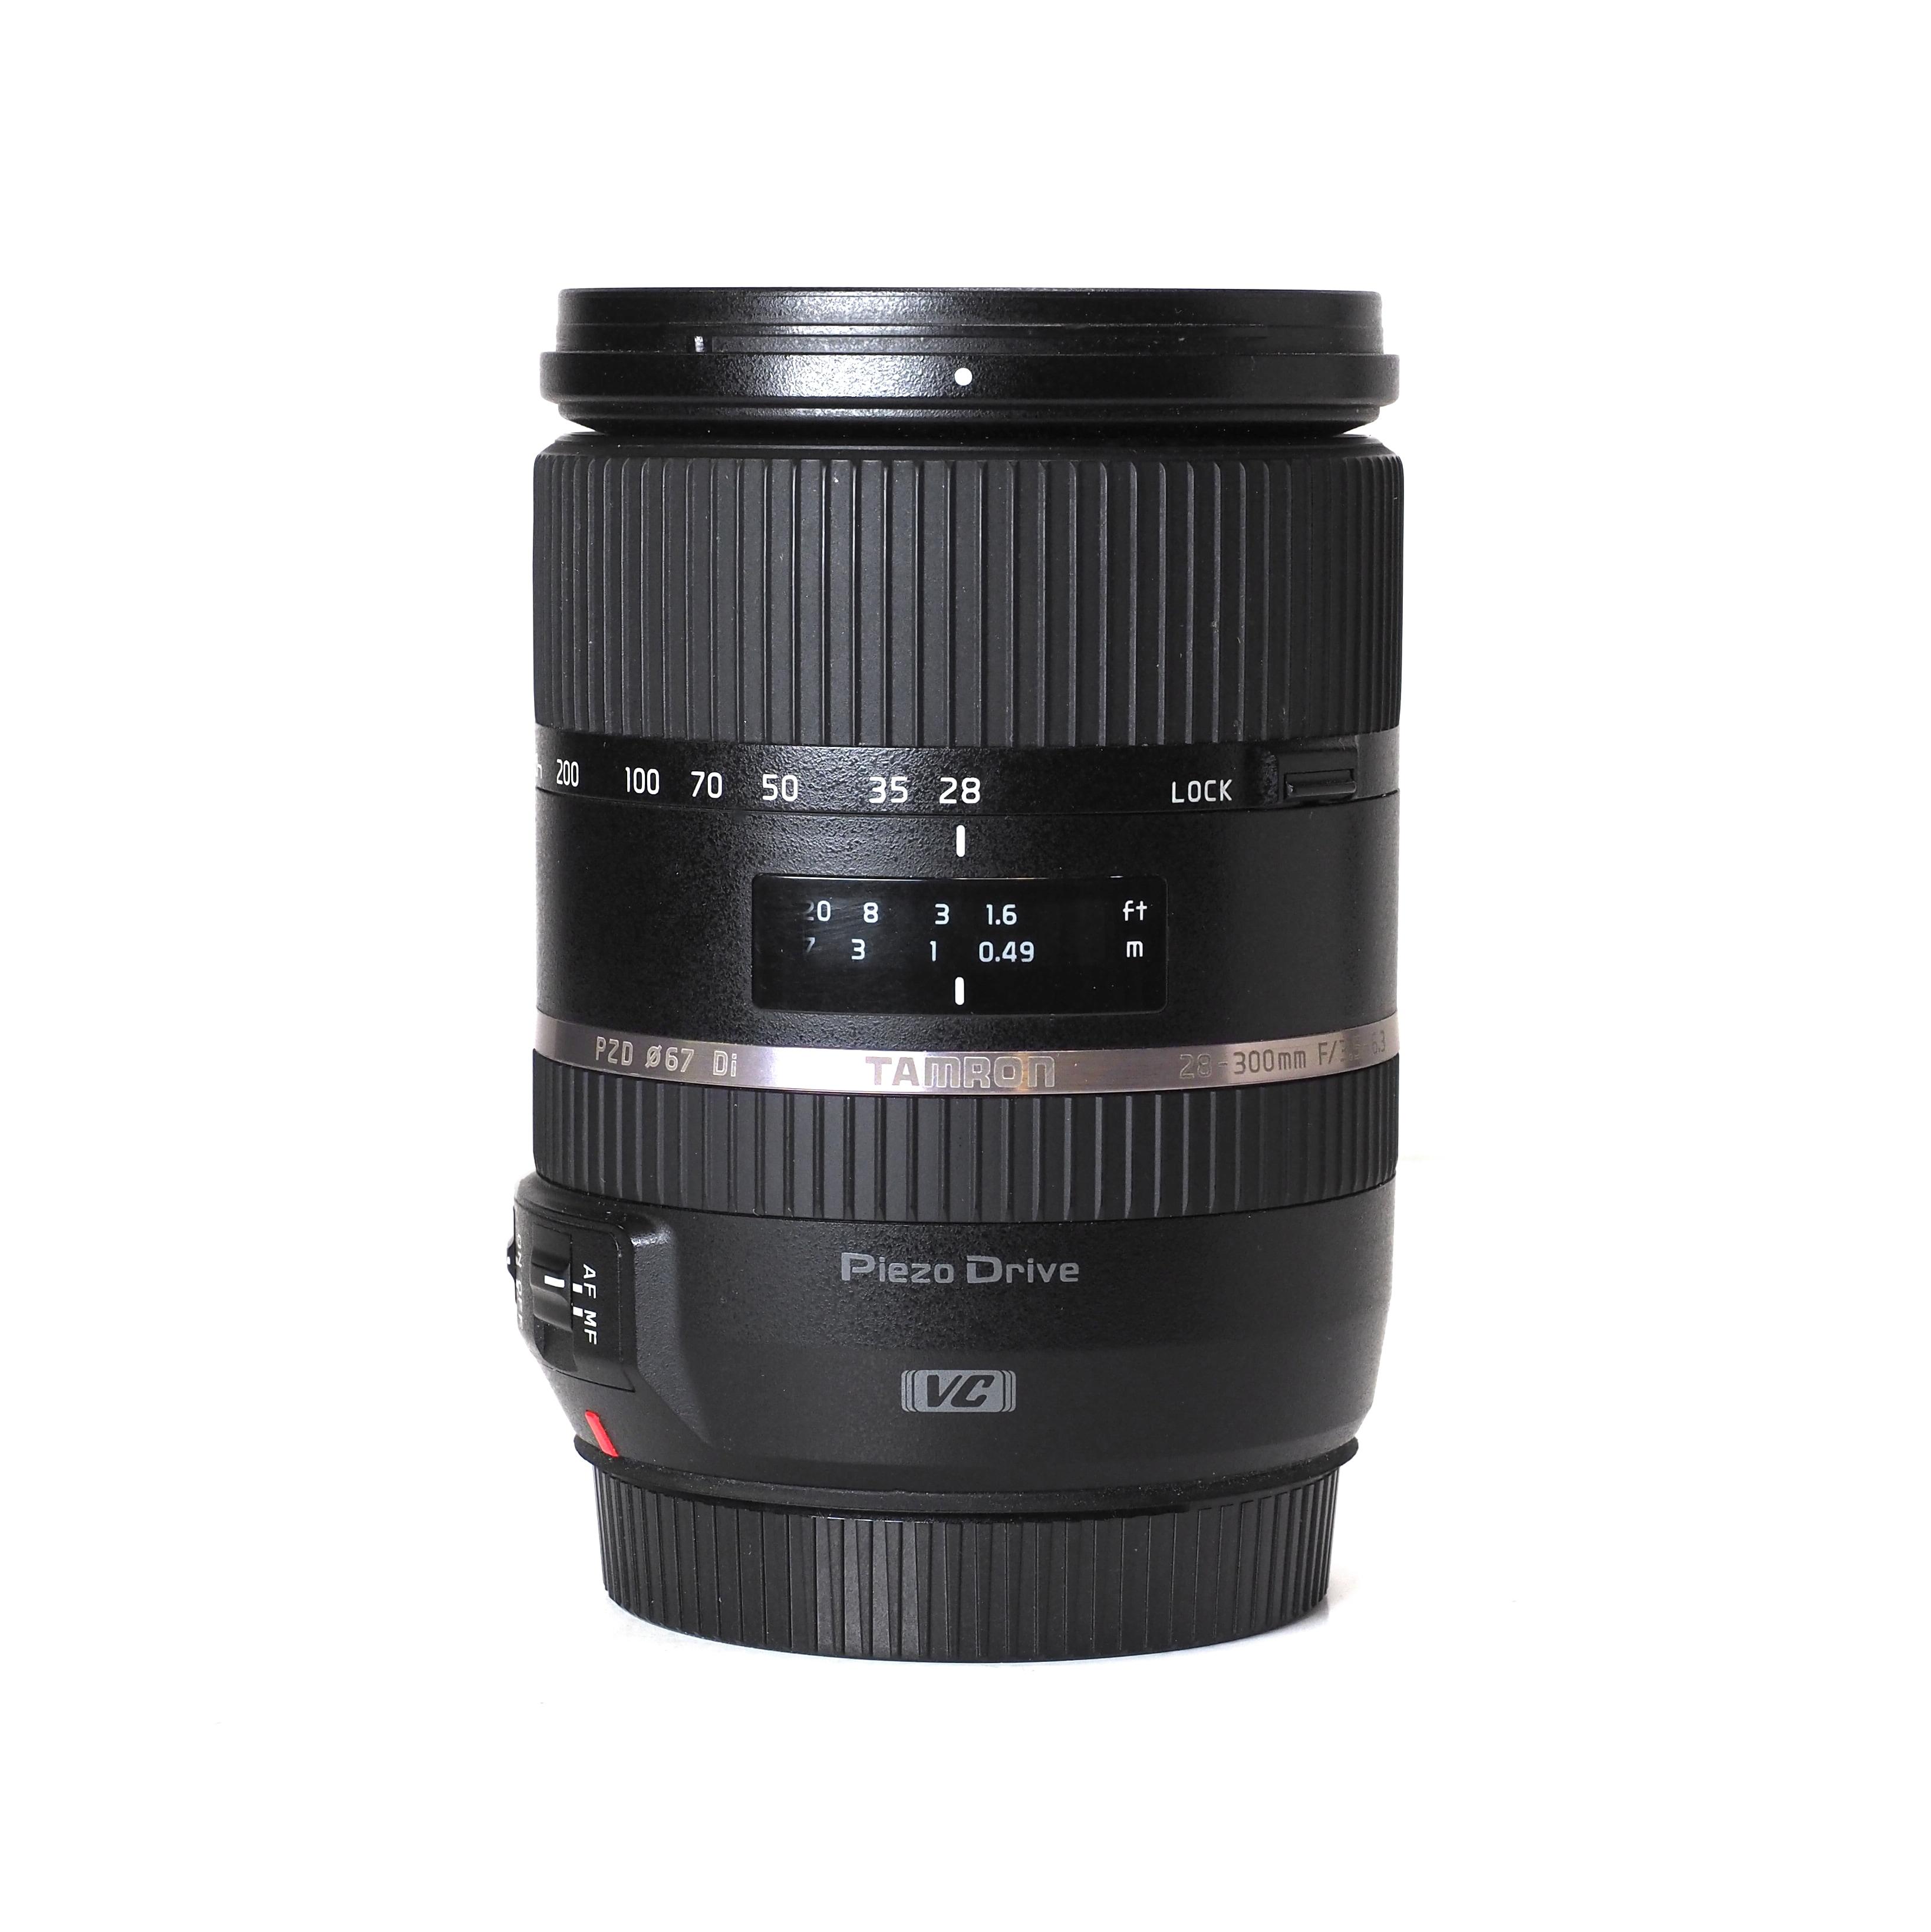 Tamron 28-300mm f/3,5-6,3 Di VC Canon EF - BEGAGNAT